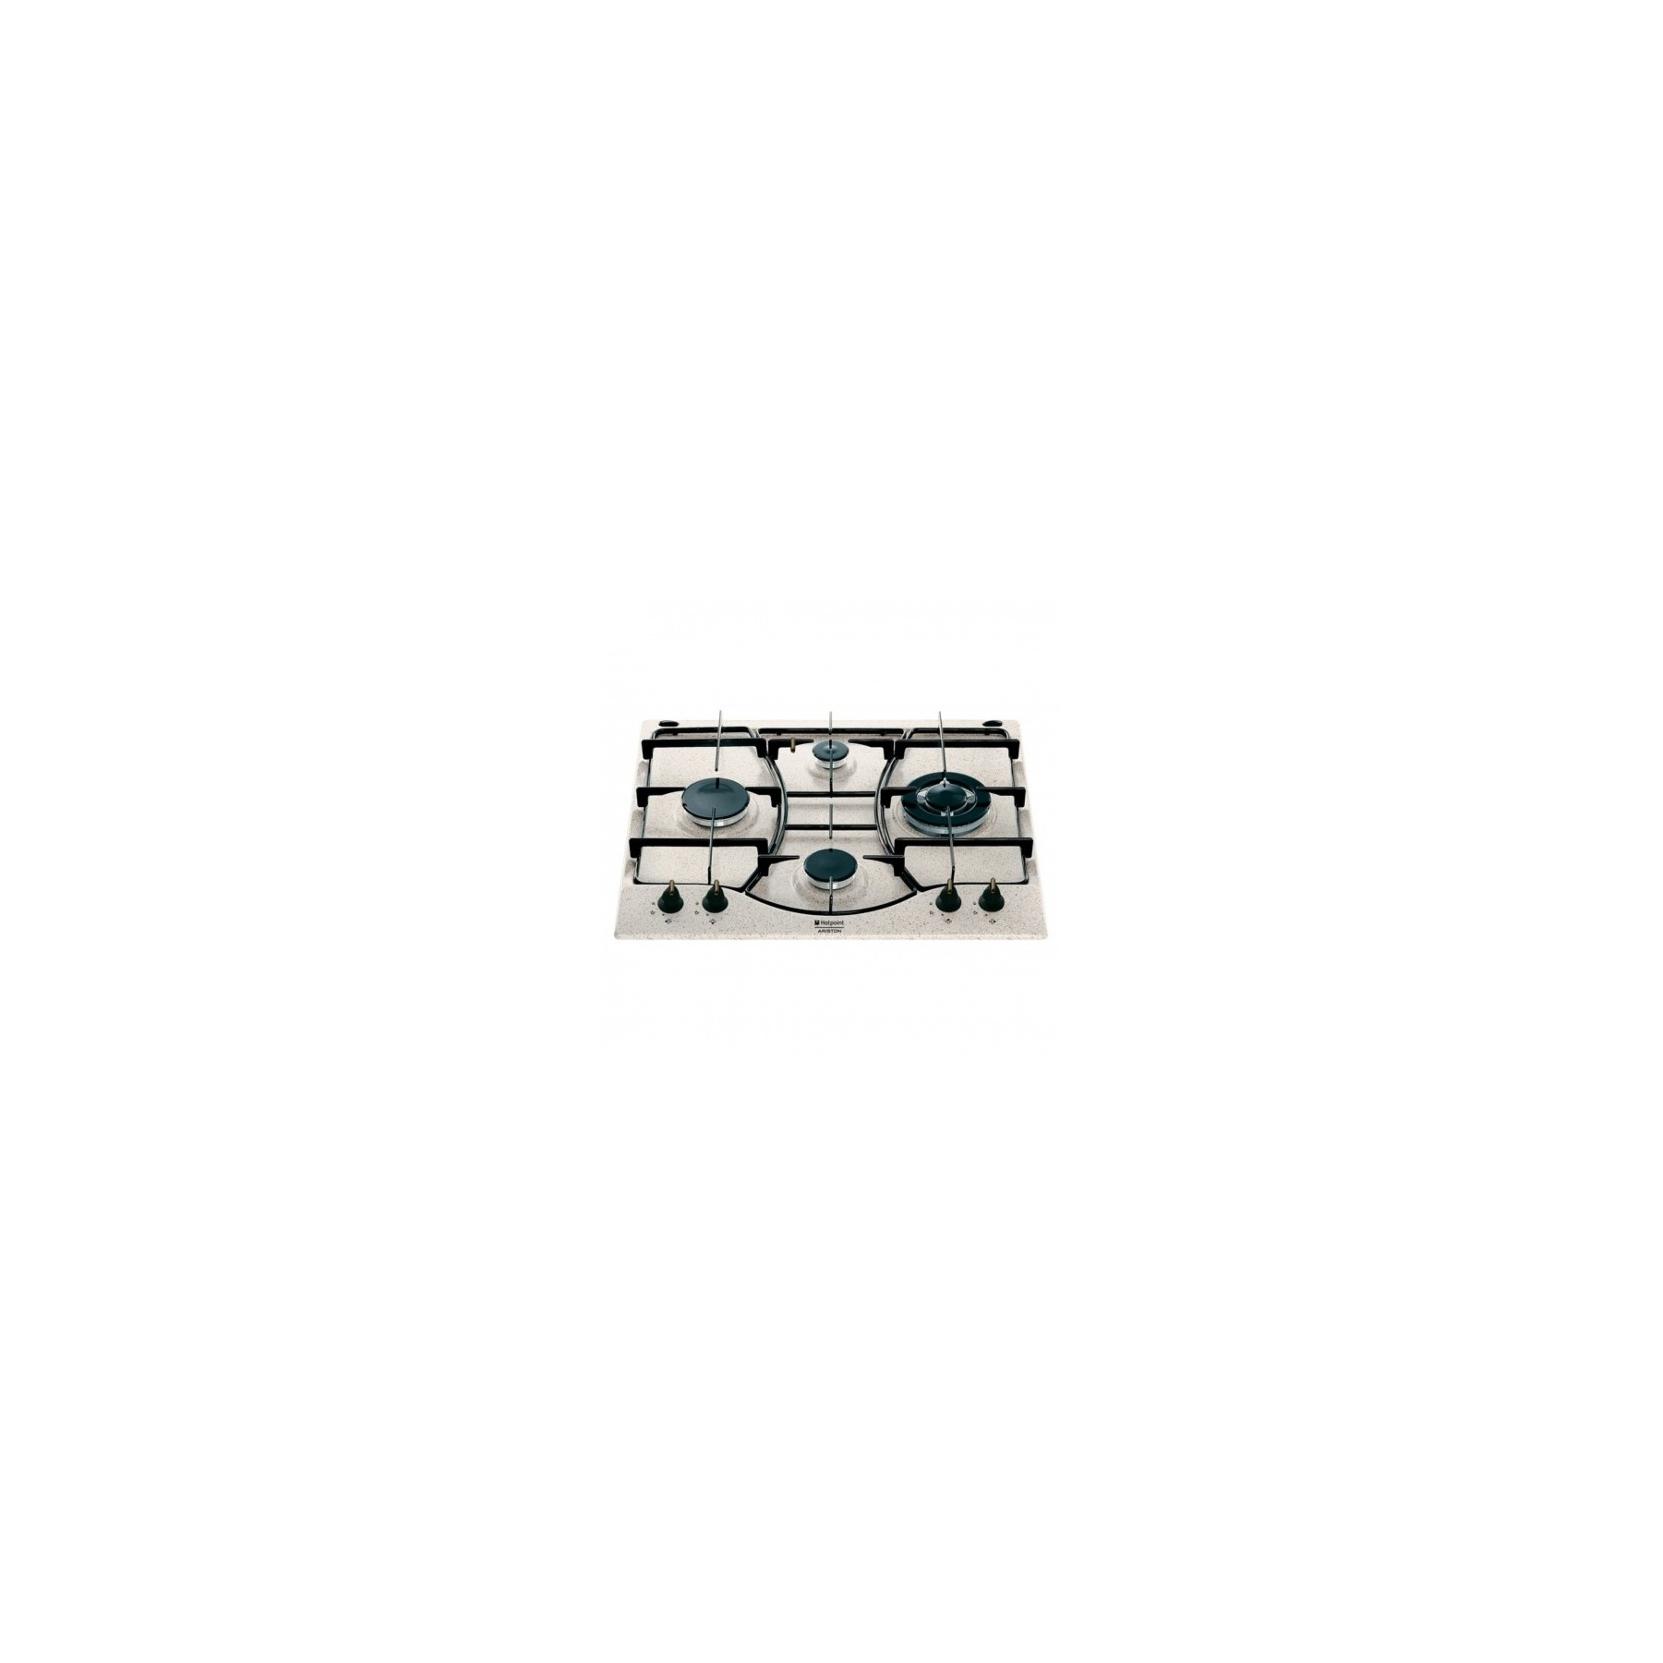 best cucina ariston 4 fuochi photos. Black Bedroom Furniture Sets. Home Design Ideas